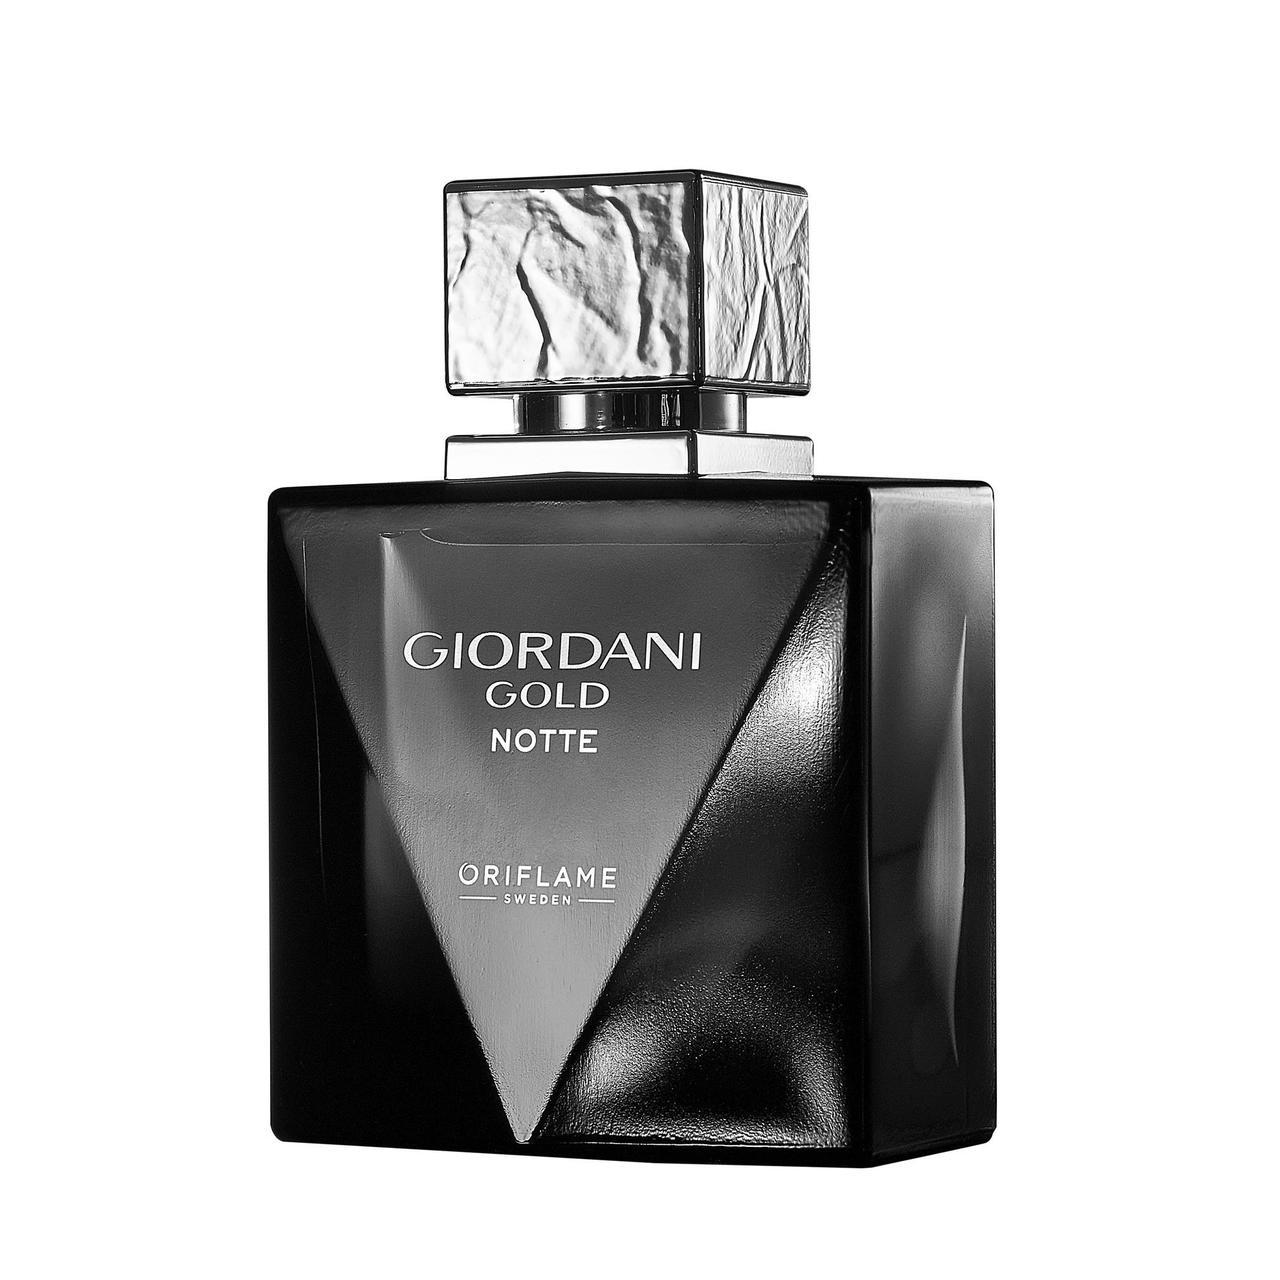 Туалетная вода Giordani Gold Notte Oriflame